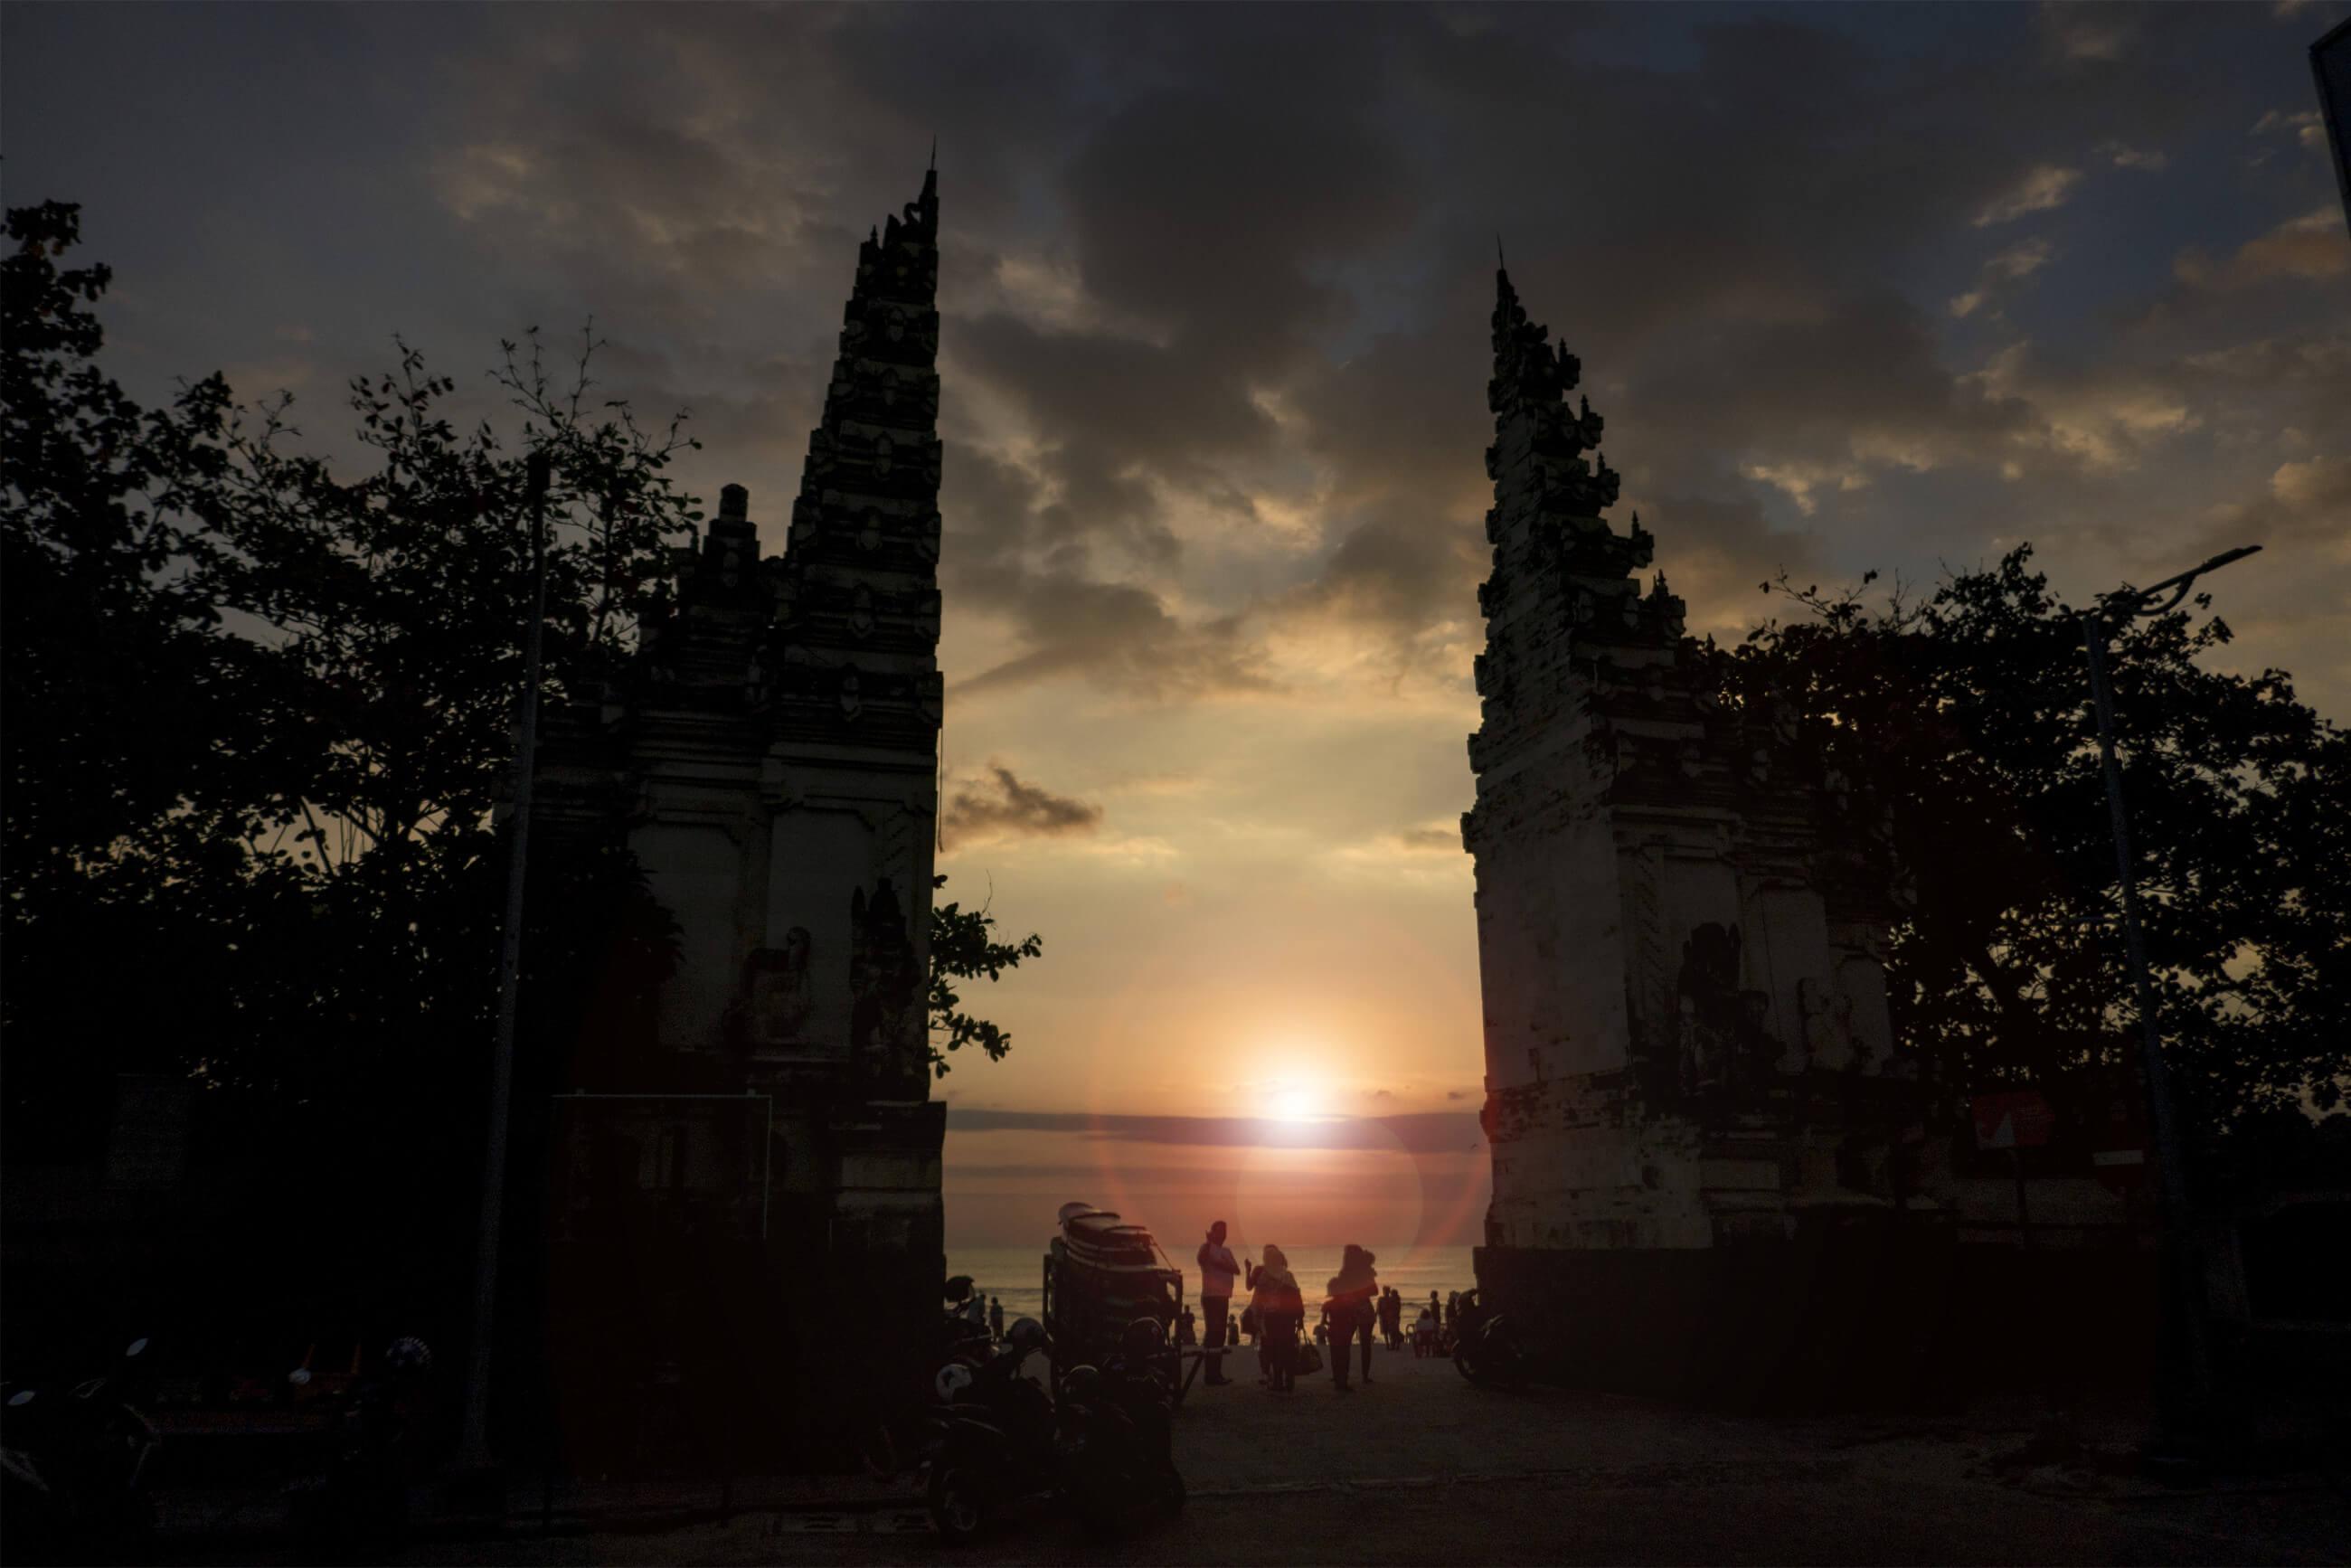 https://bubo.sk/uploads/galleries/7308/martinsimko_indonezia_klf_p1050582-flare.jpg